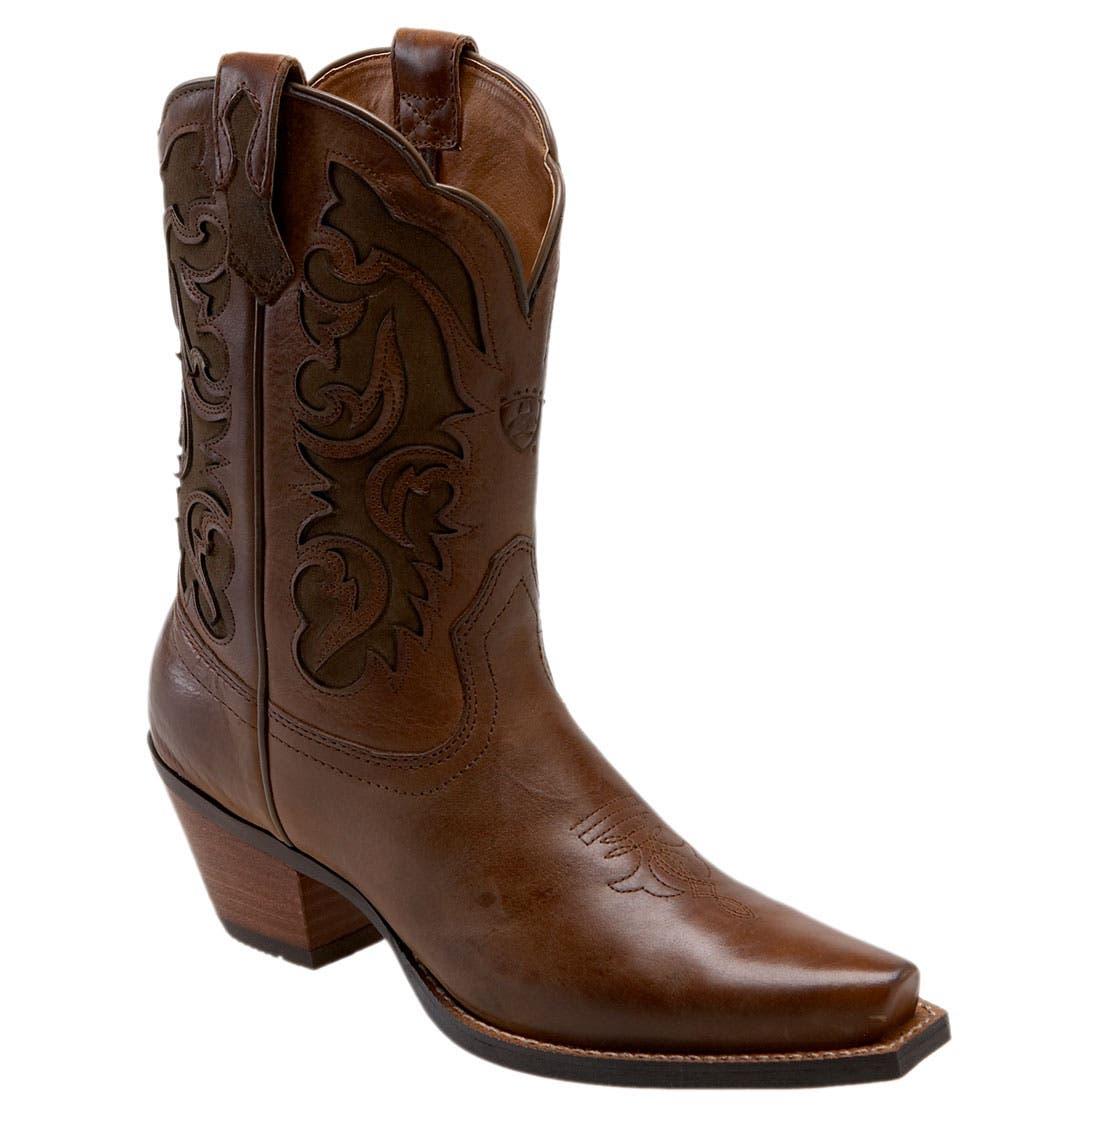 Main Image - Ariat 'Shada' boot